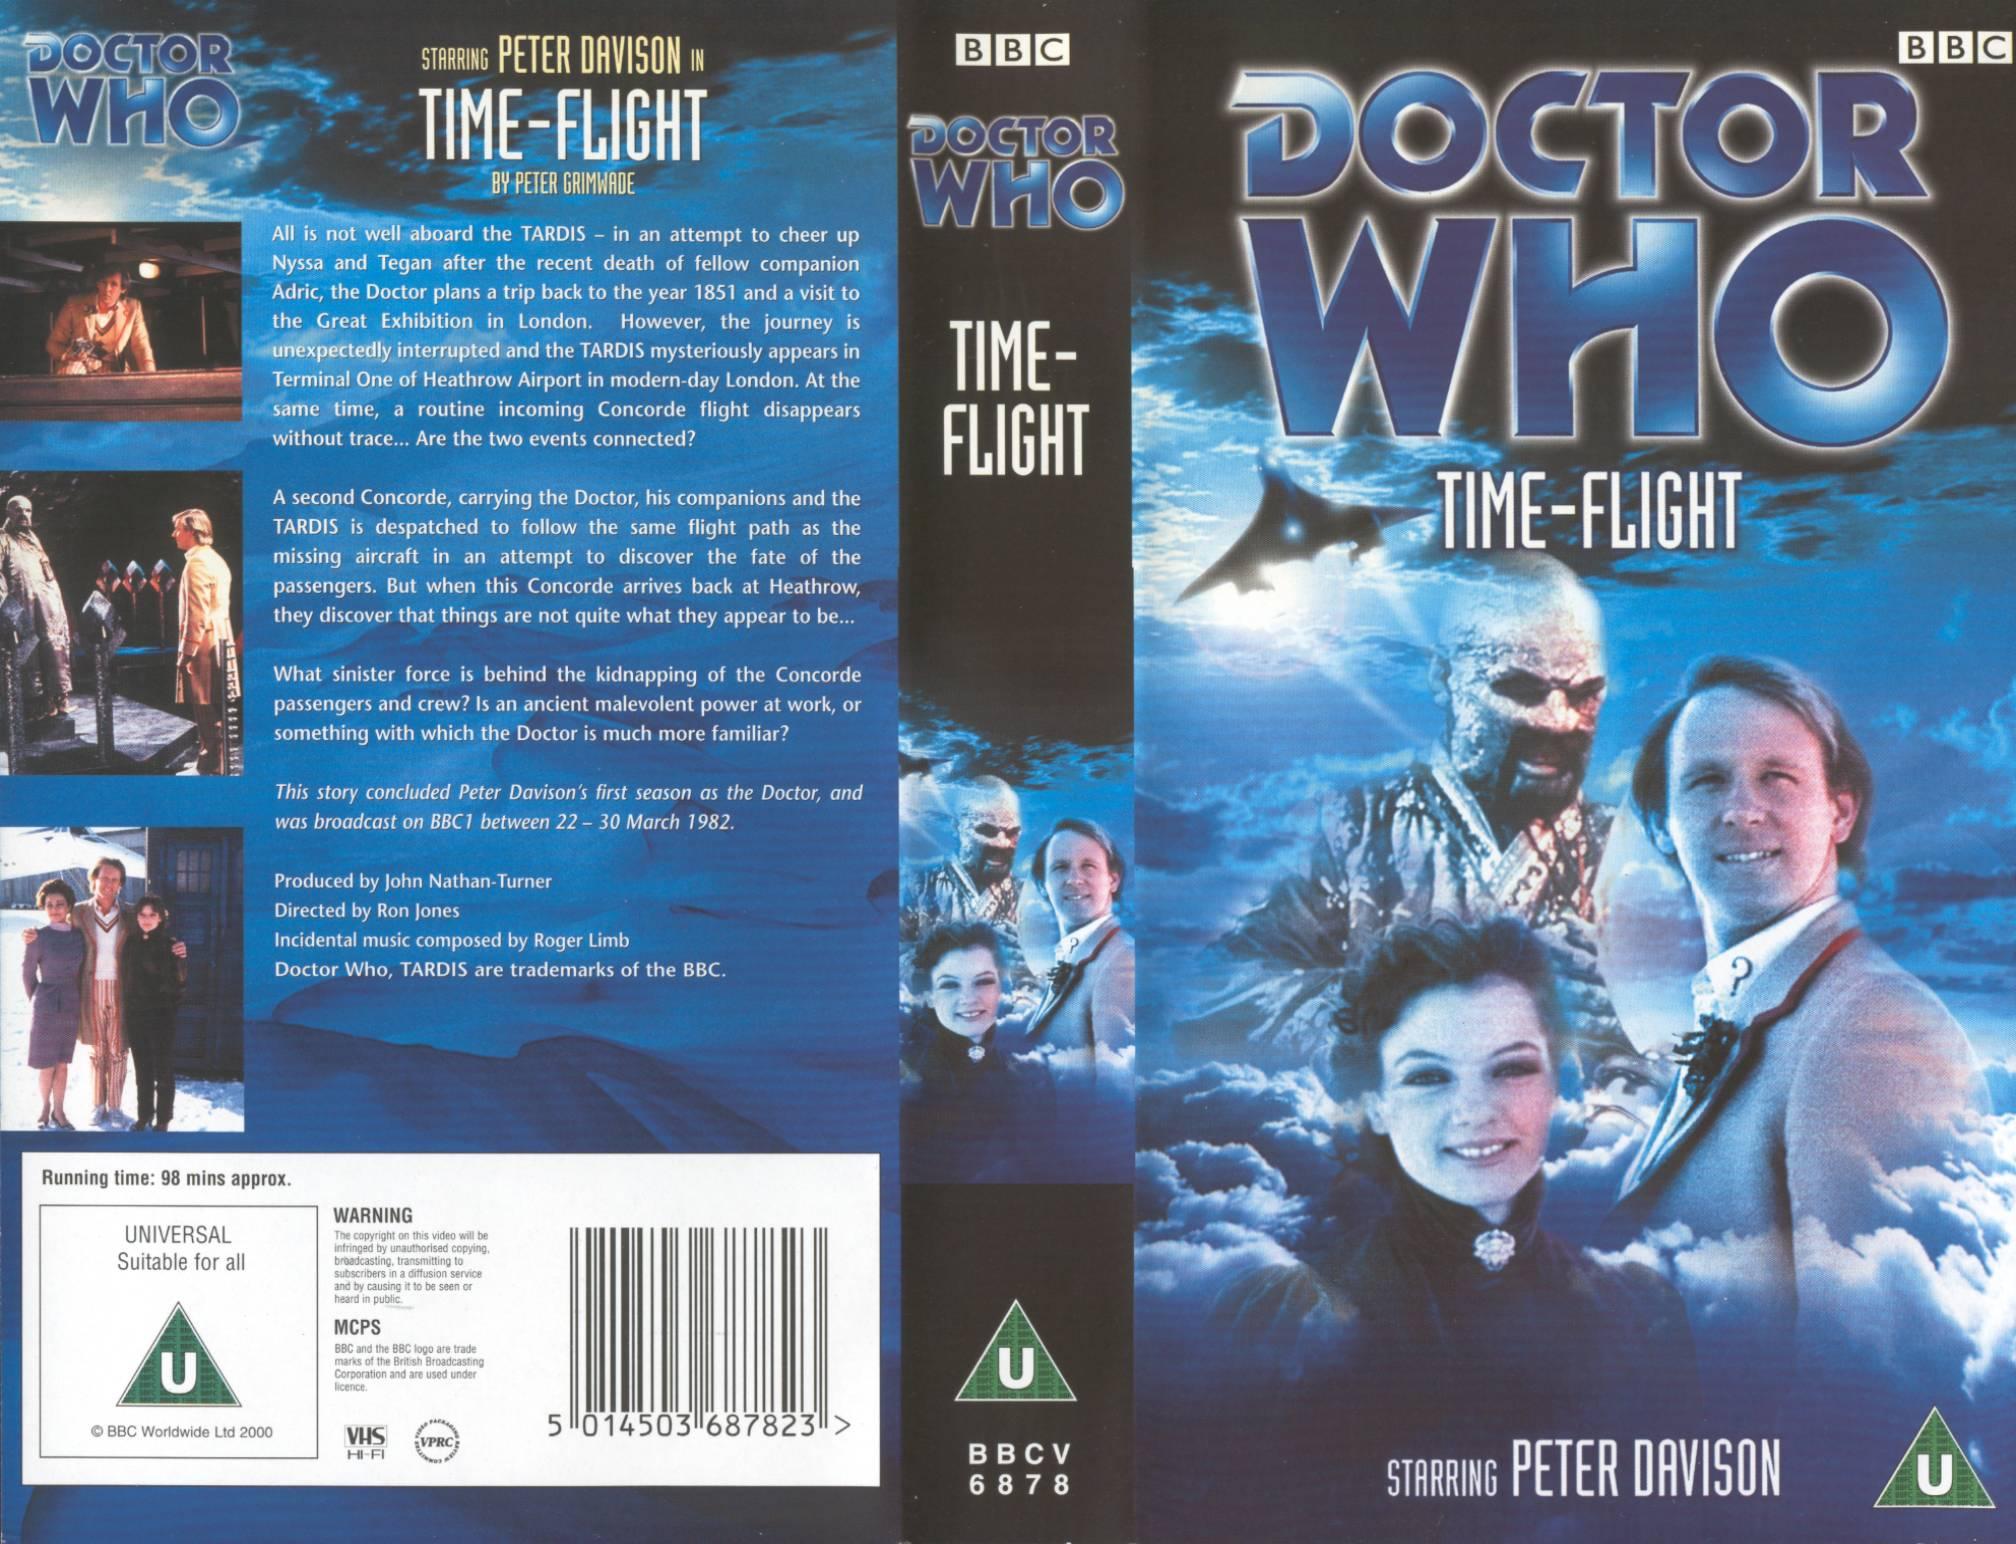 Time-flight VHS